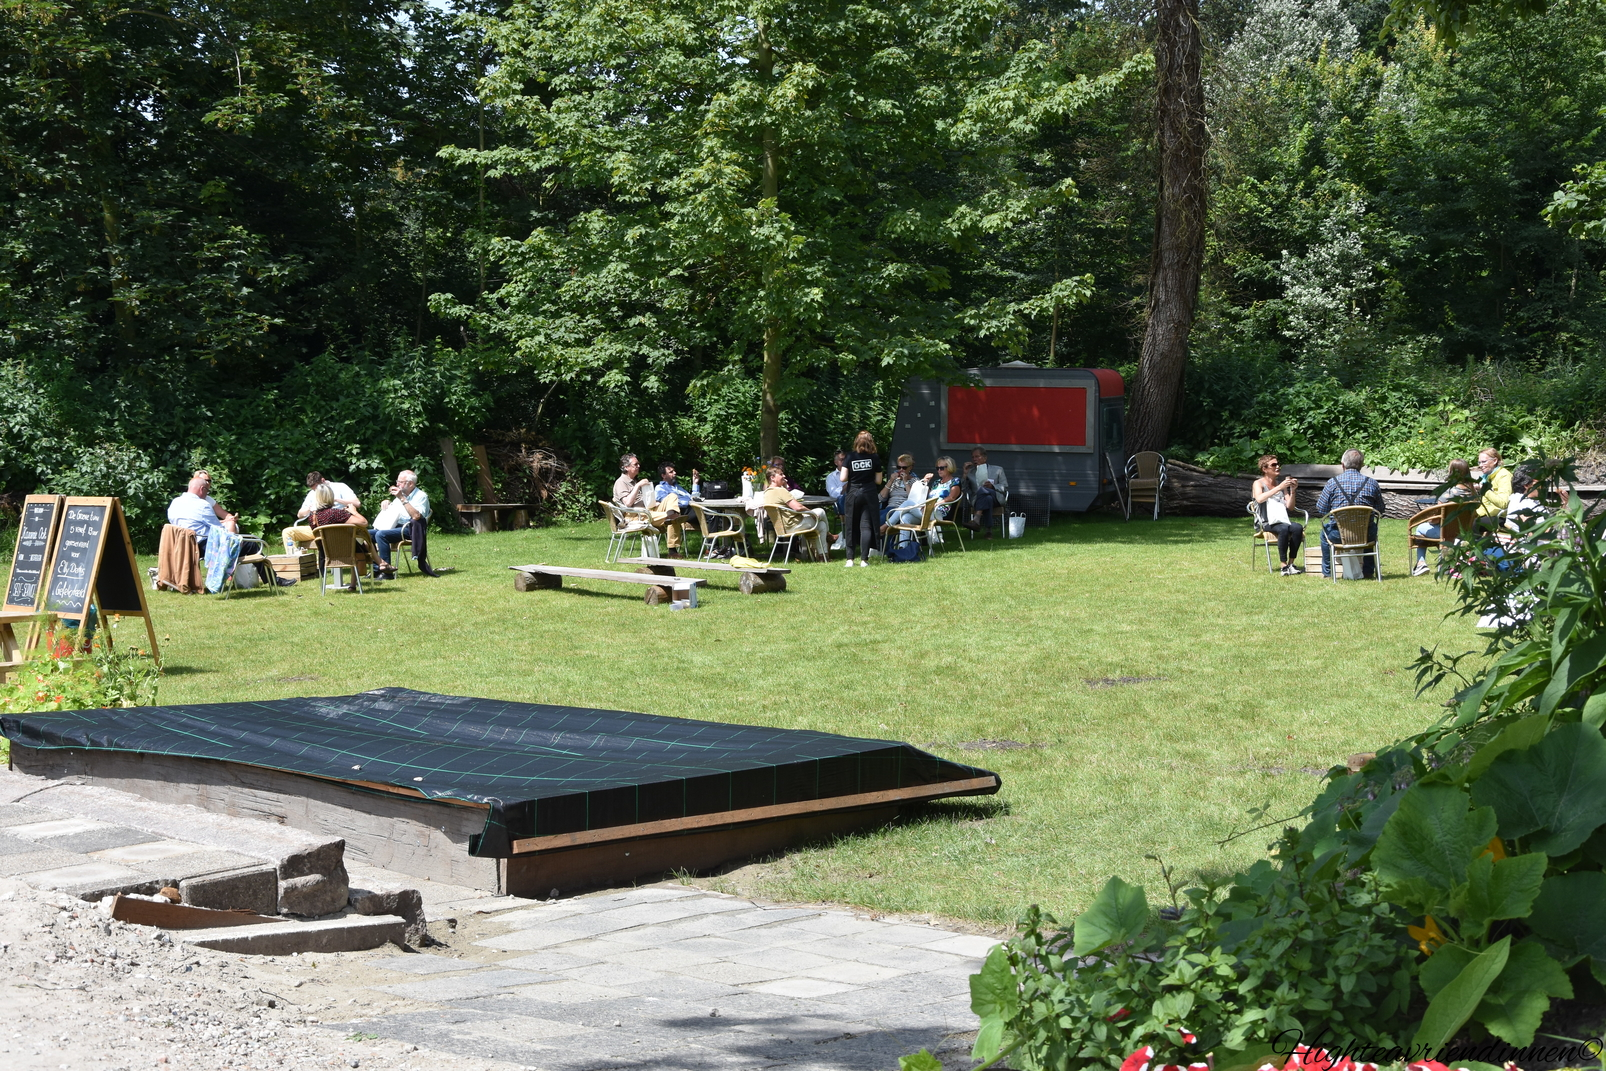 Buitenplaats Ockenburg, Open podium, high tea vriendinnen